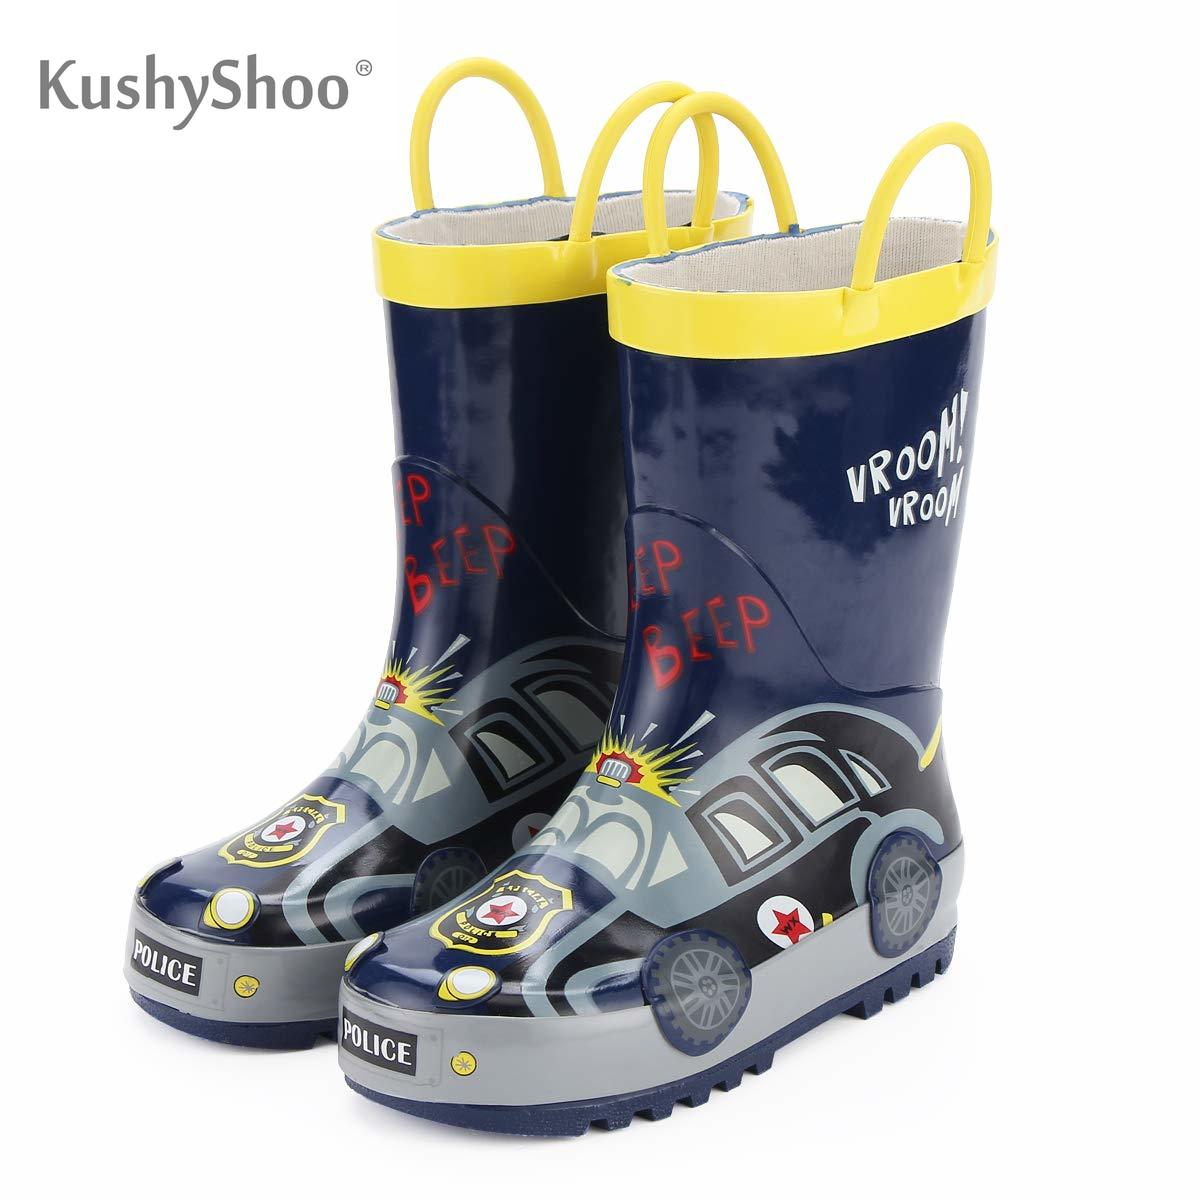 KushyShoo Kids Rain Boots Boys Children Shoes Rainboots Loverly Waterproof Water Shoes Children's Rubber Boots Outside